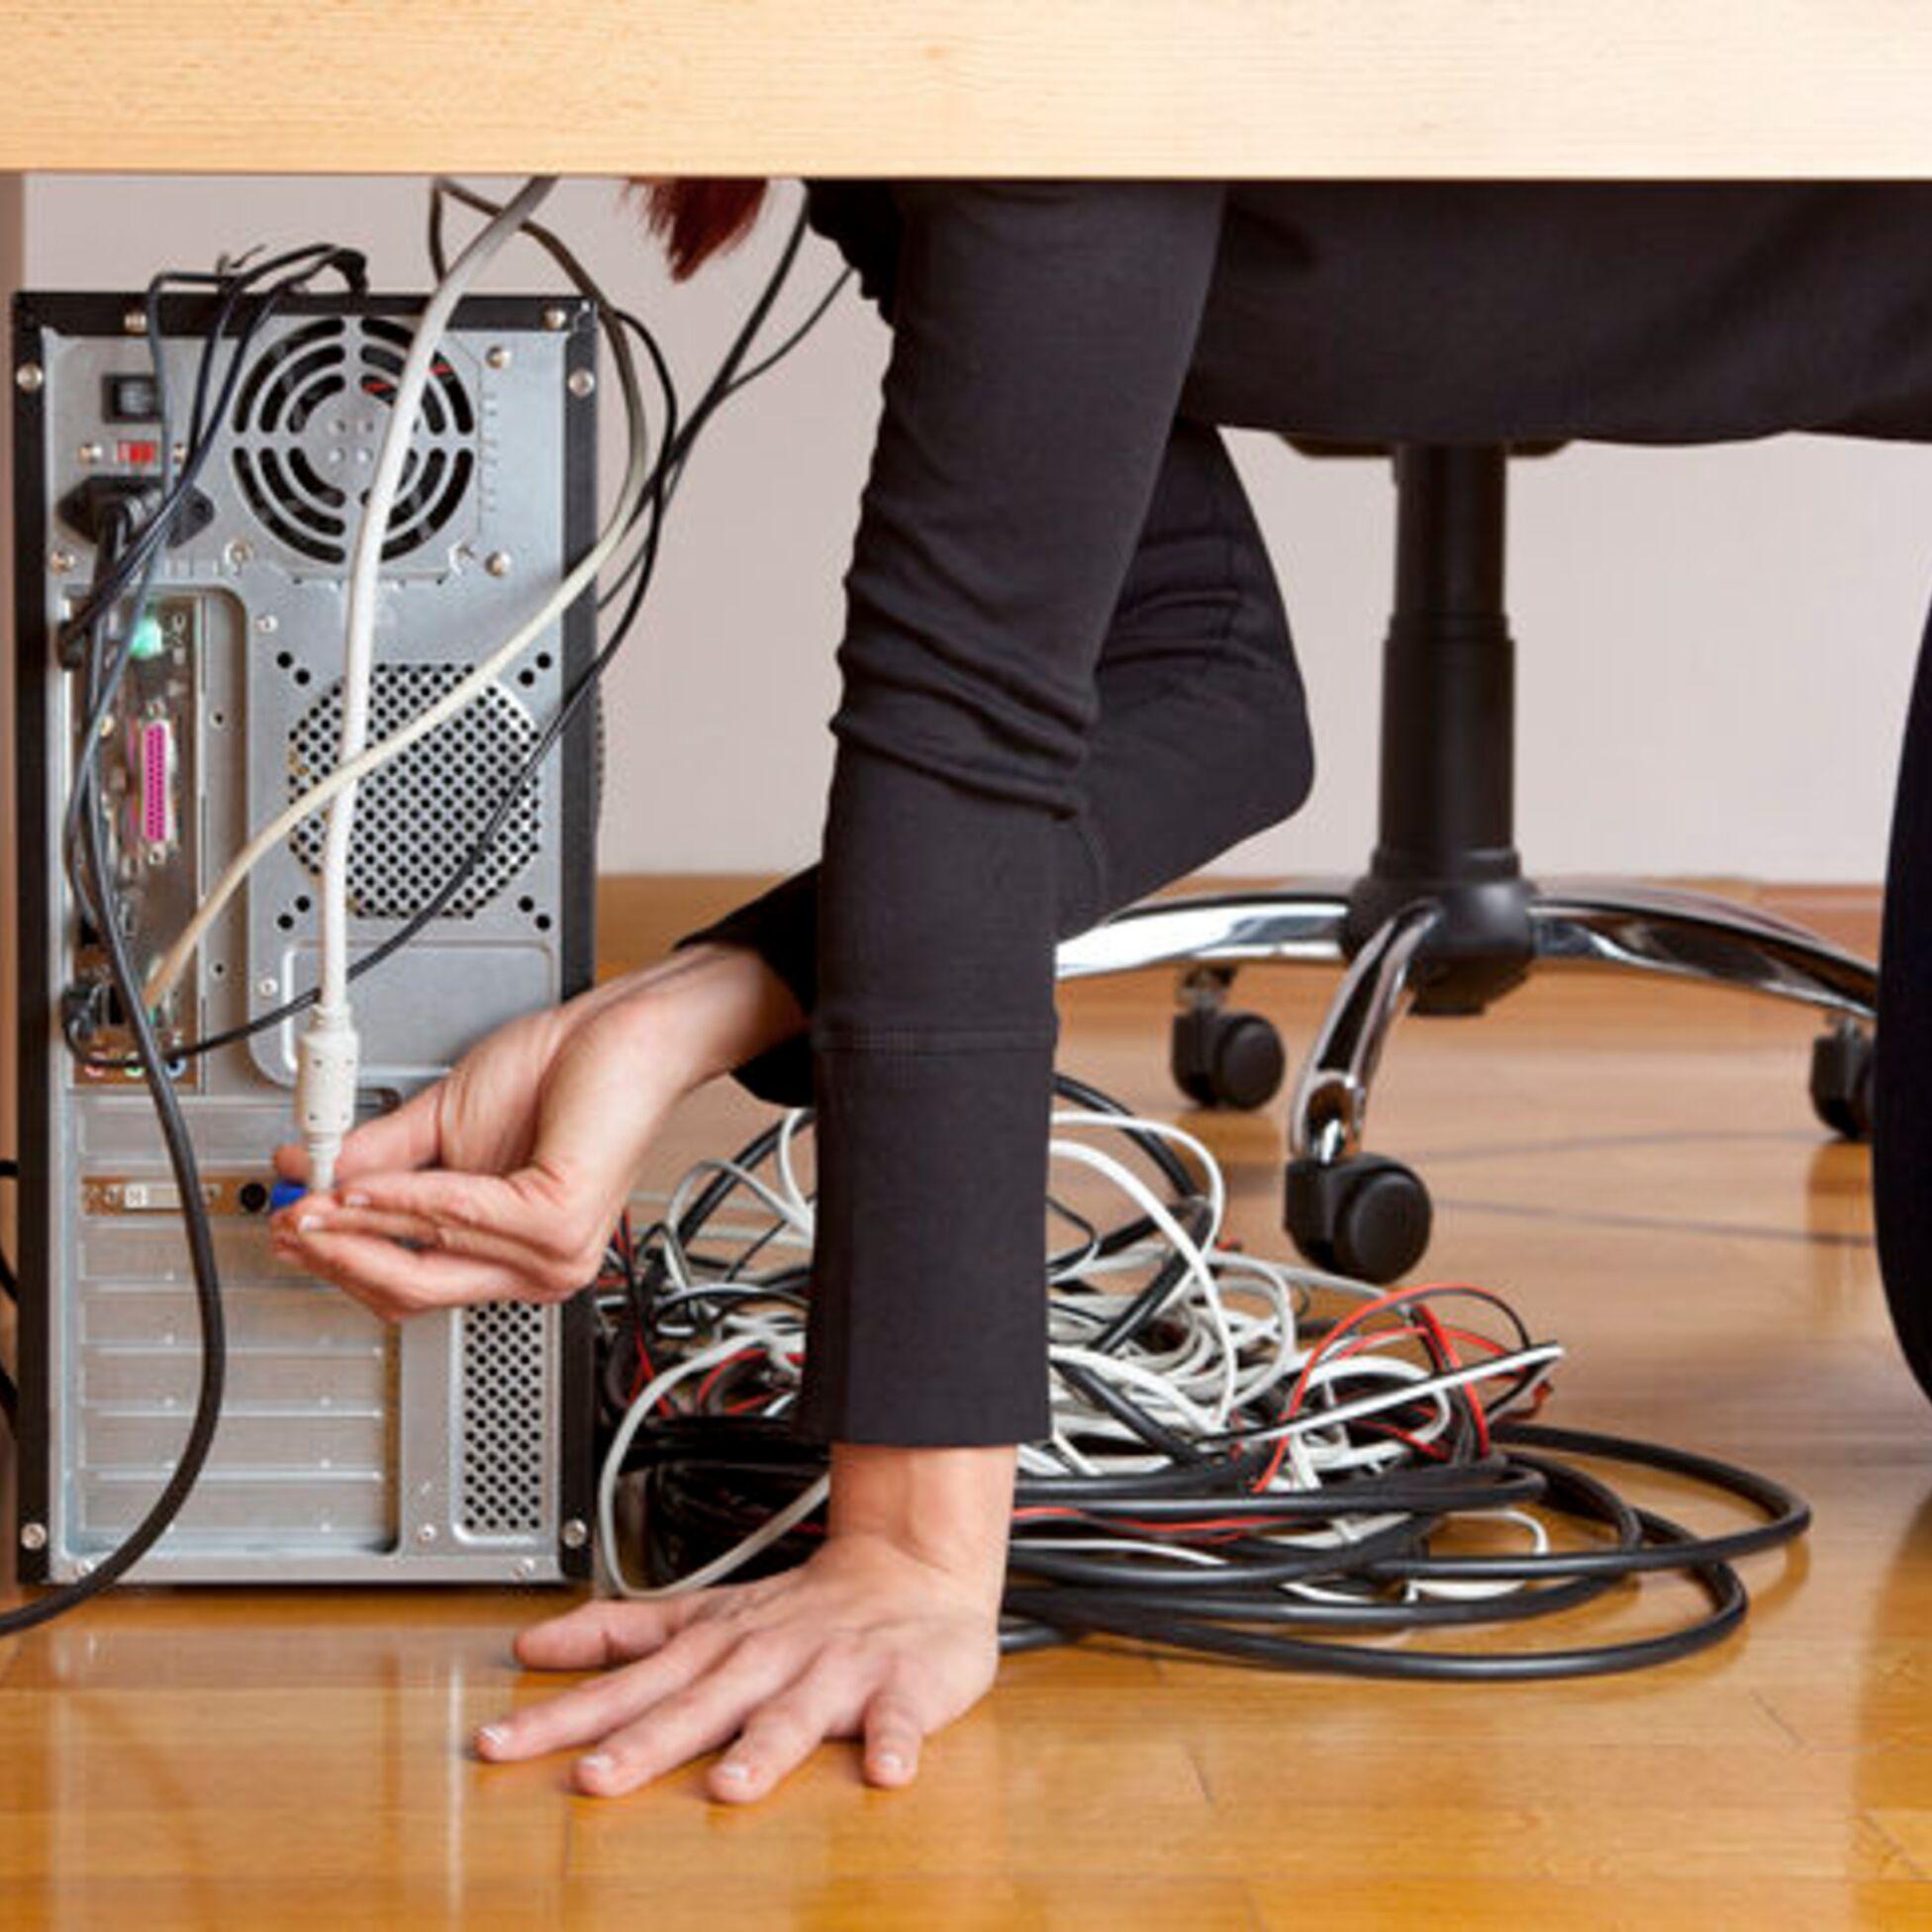 Frau steckt Kabel in PC